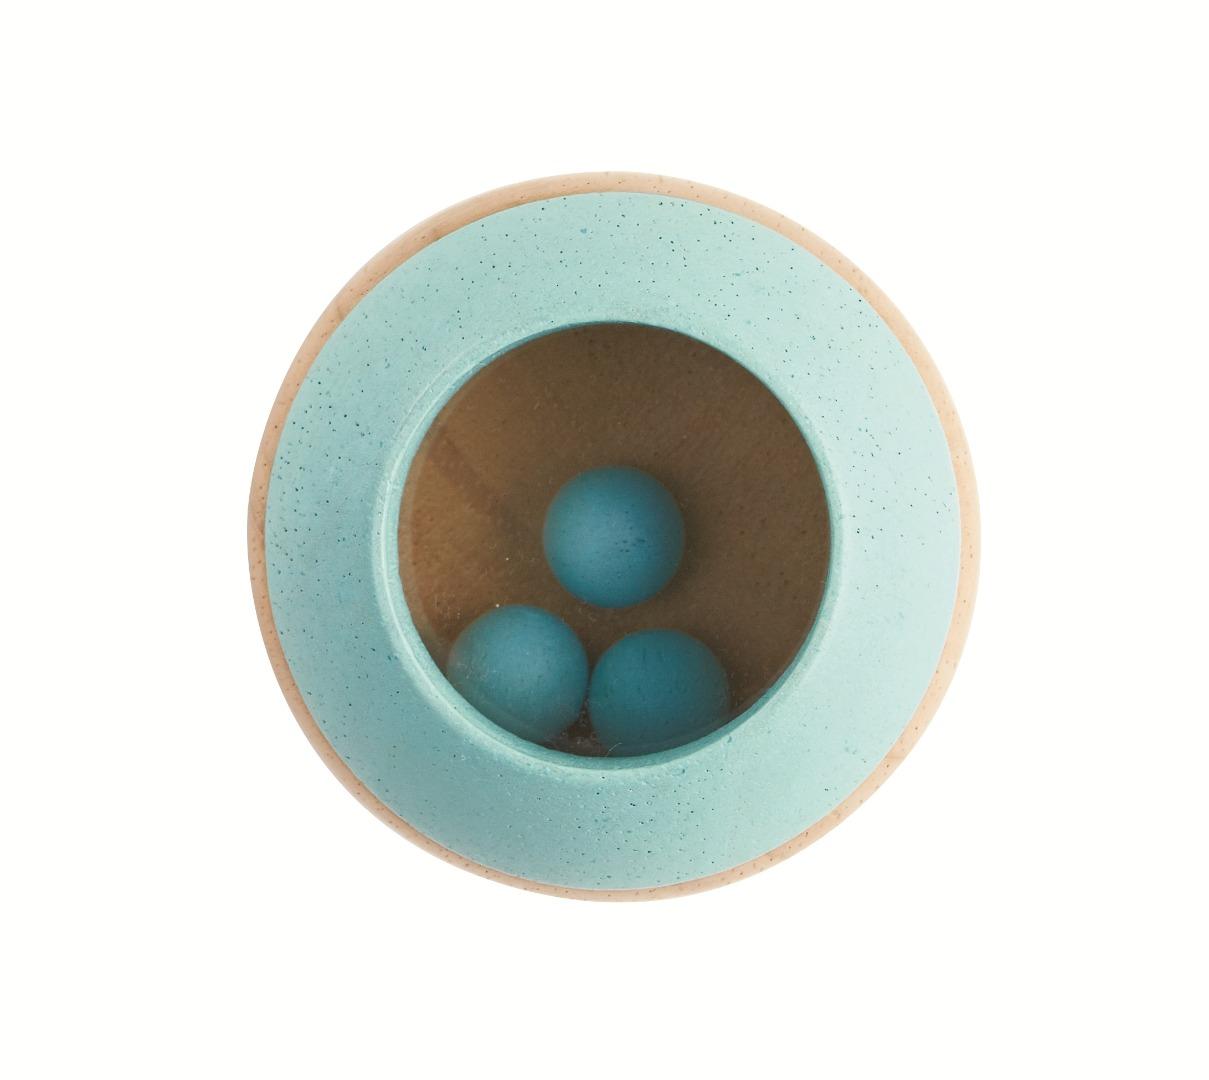 PlanToys Fühlspass Sensorig Spielzeug 4